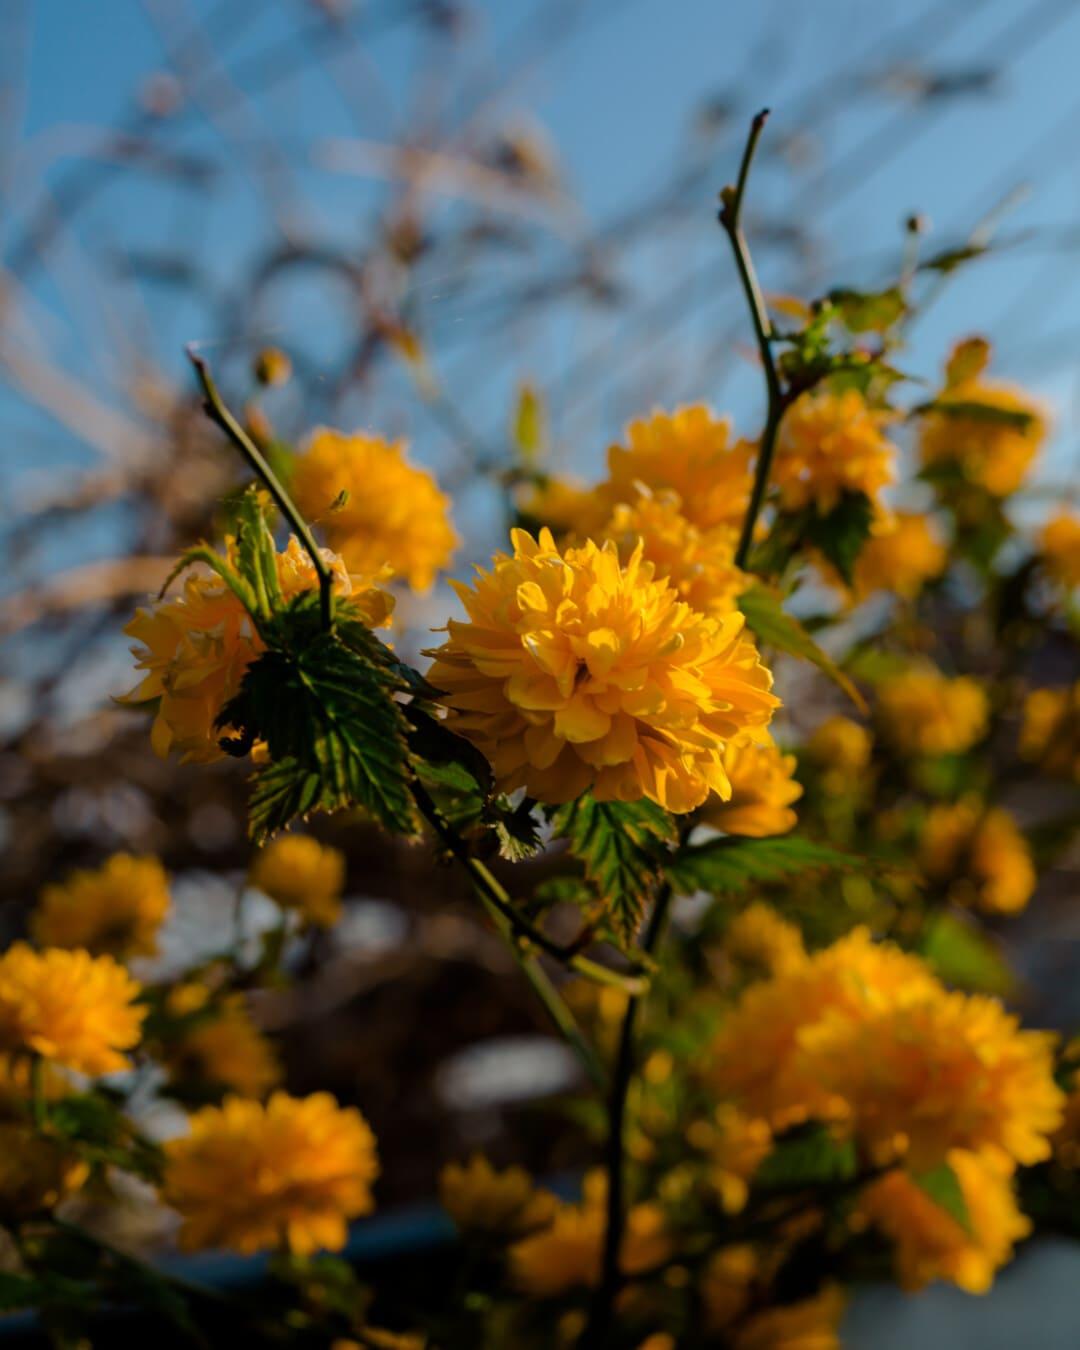 orange yellow, shrub, flowers, branches, yellow, spring, petal, herb, nature, blossom